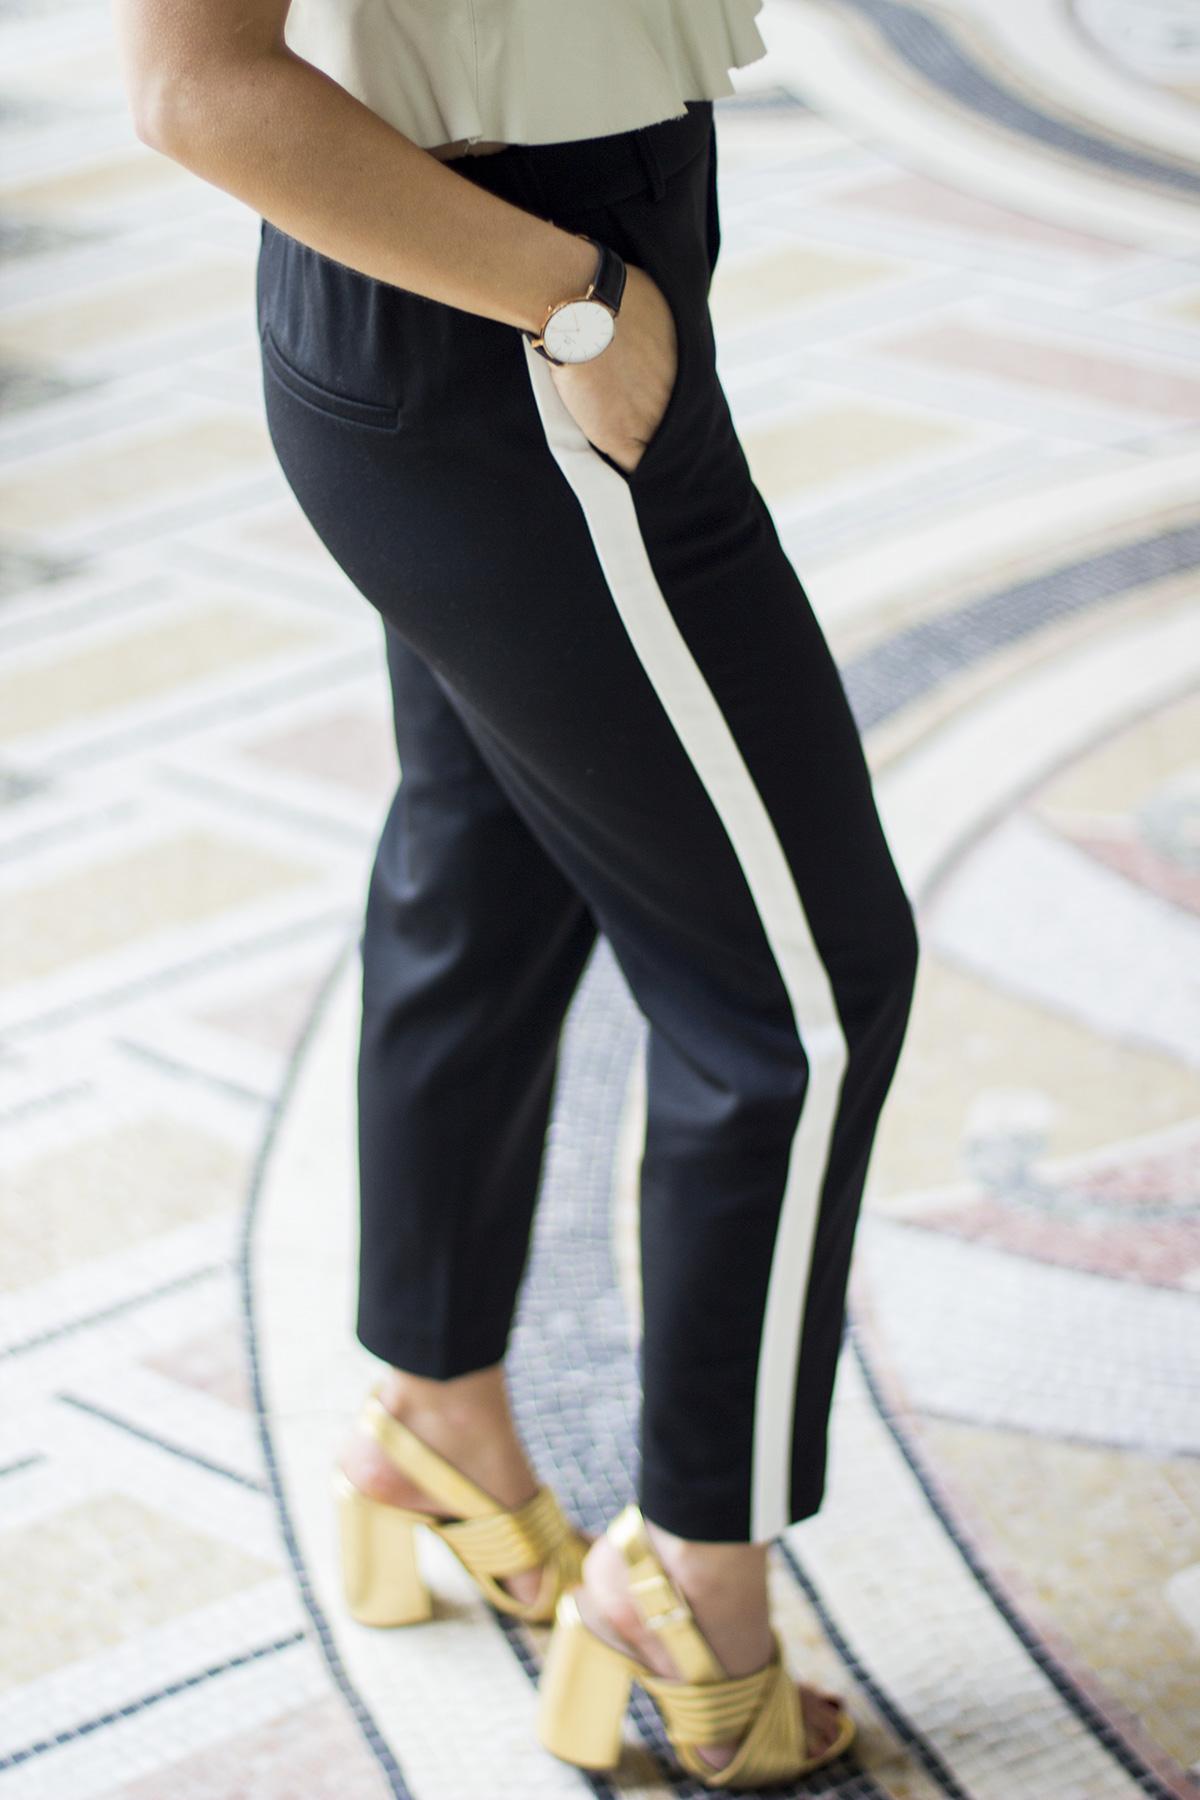 comment porter le jogging bandes la minute fashion. Black Bedroom Furniture Sets. Home Design Ideas